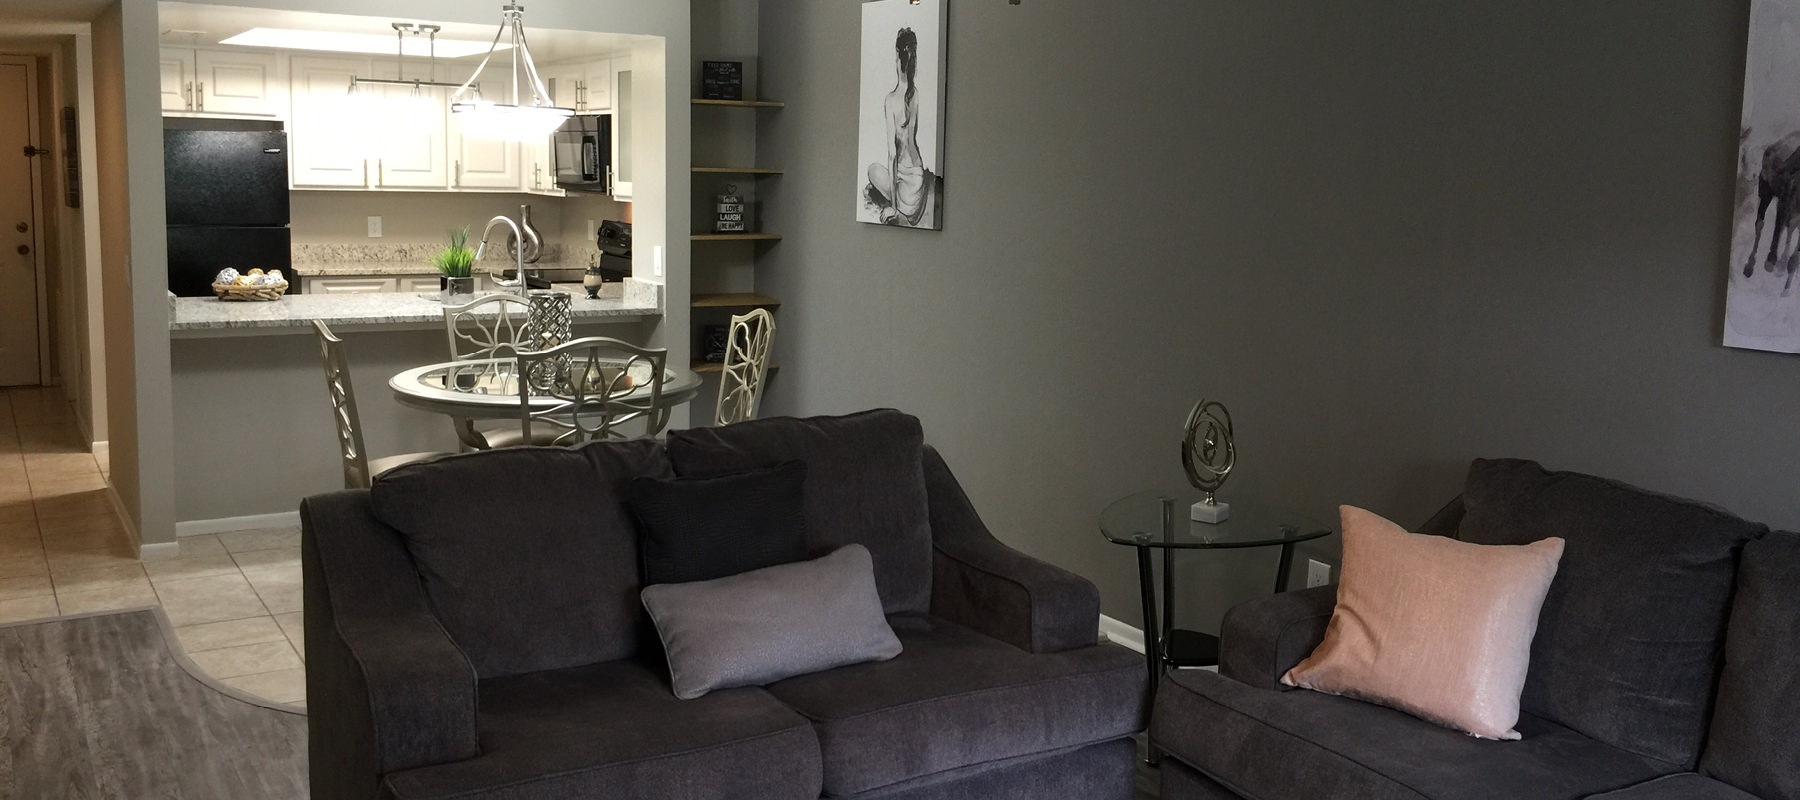 Tastefully appointed living room